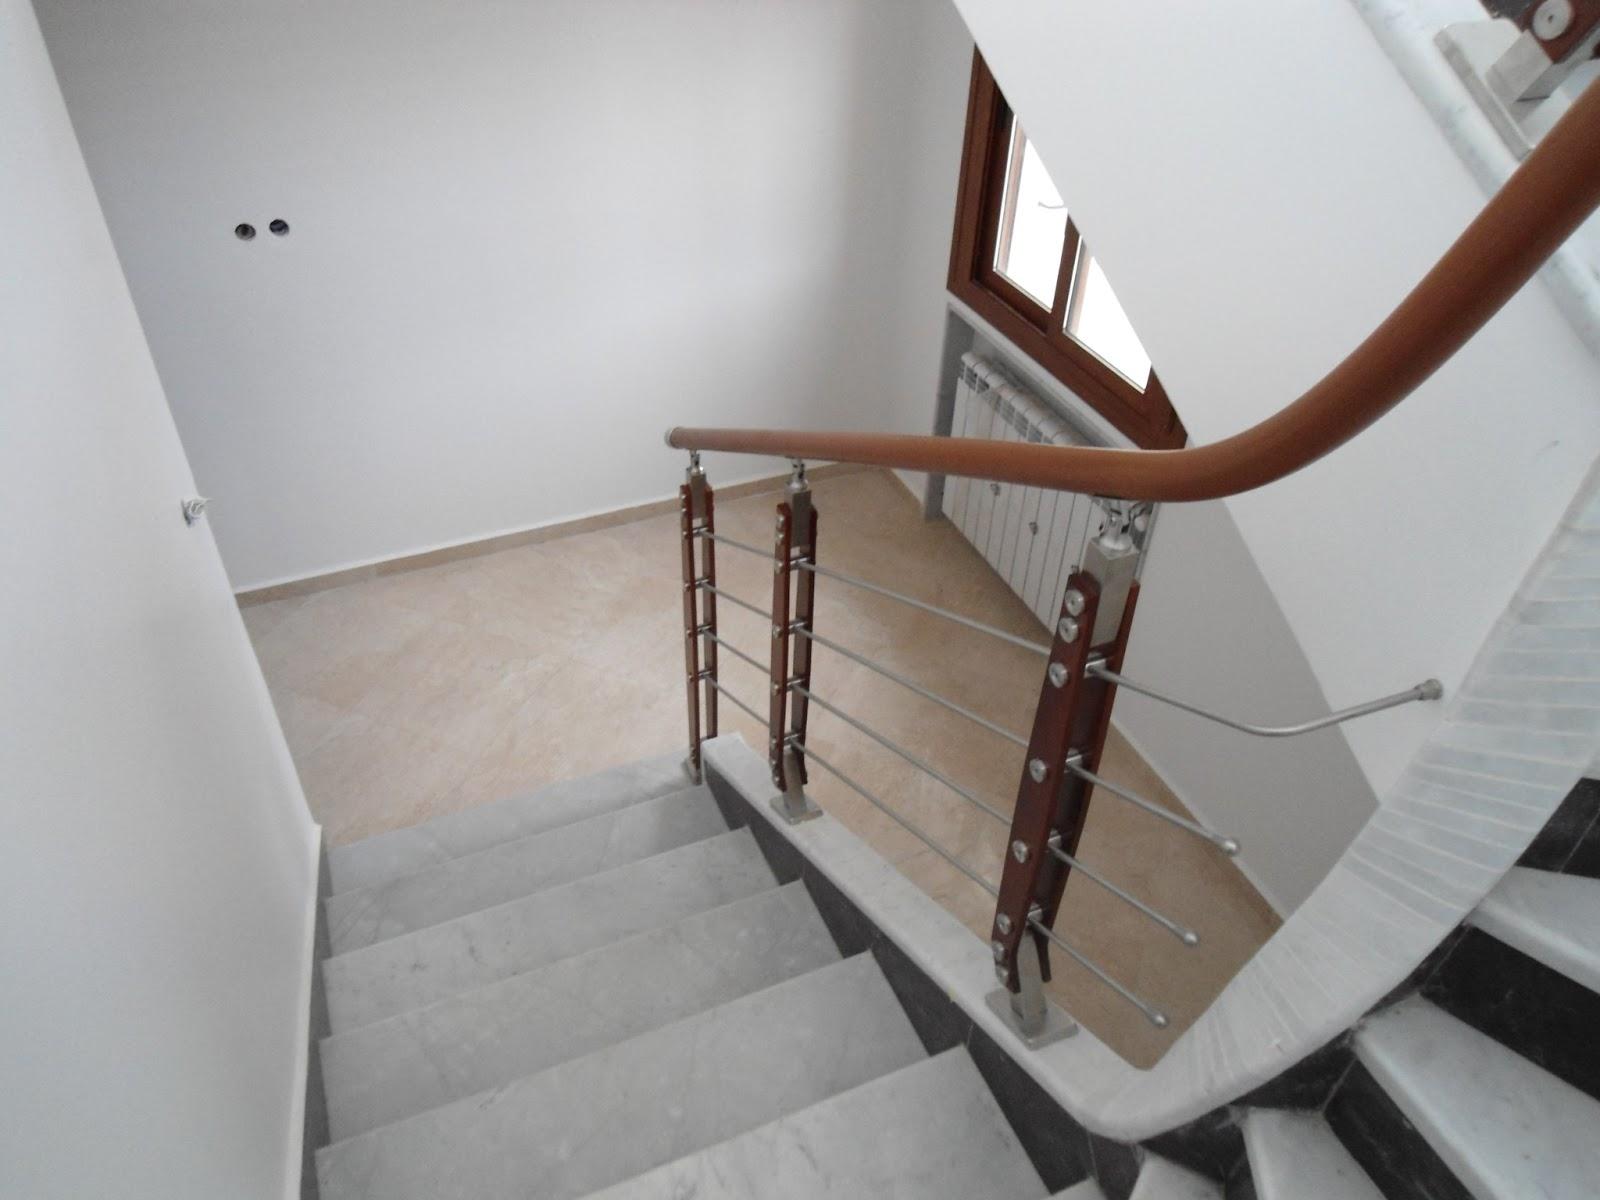 torneados munoz algerie rampes d escalier en inox et bois model a800 030 avec main courante. Black Bedroom Furniture Sets. Home Design Ideas